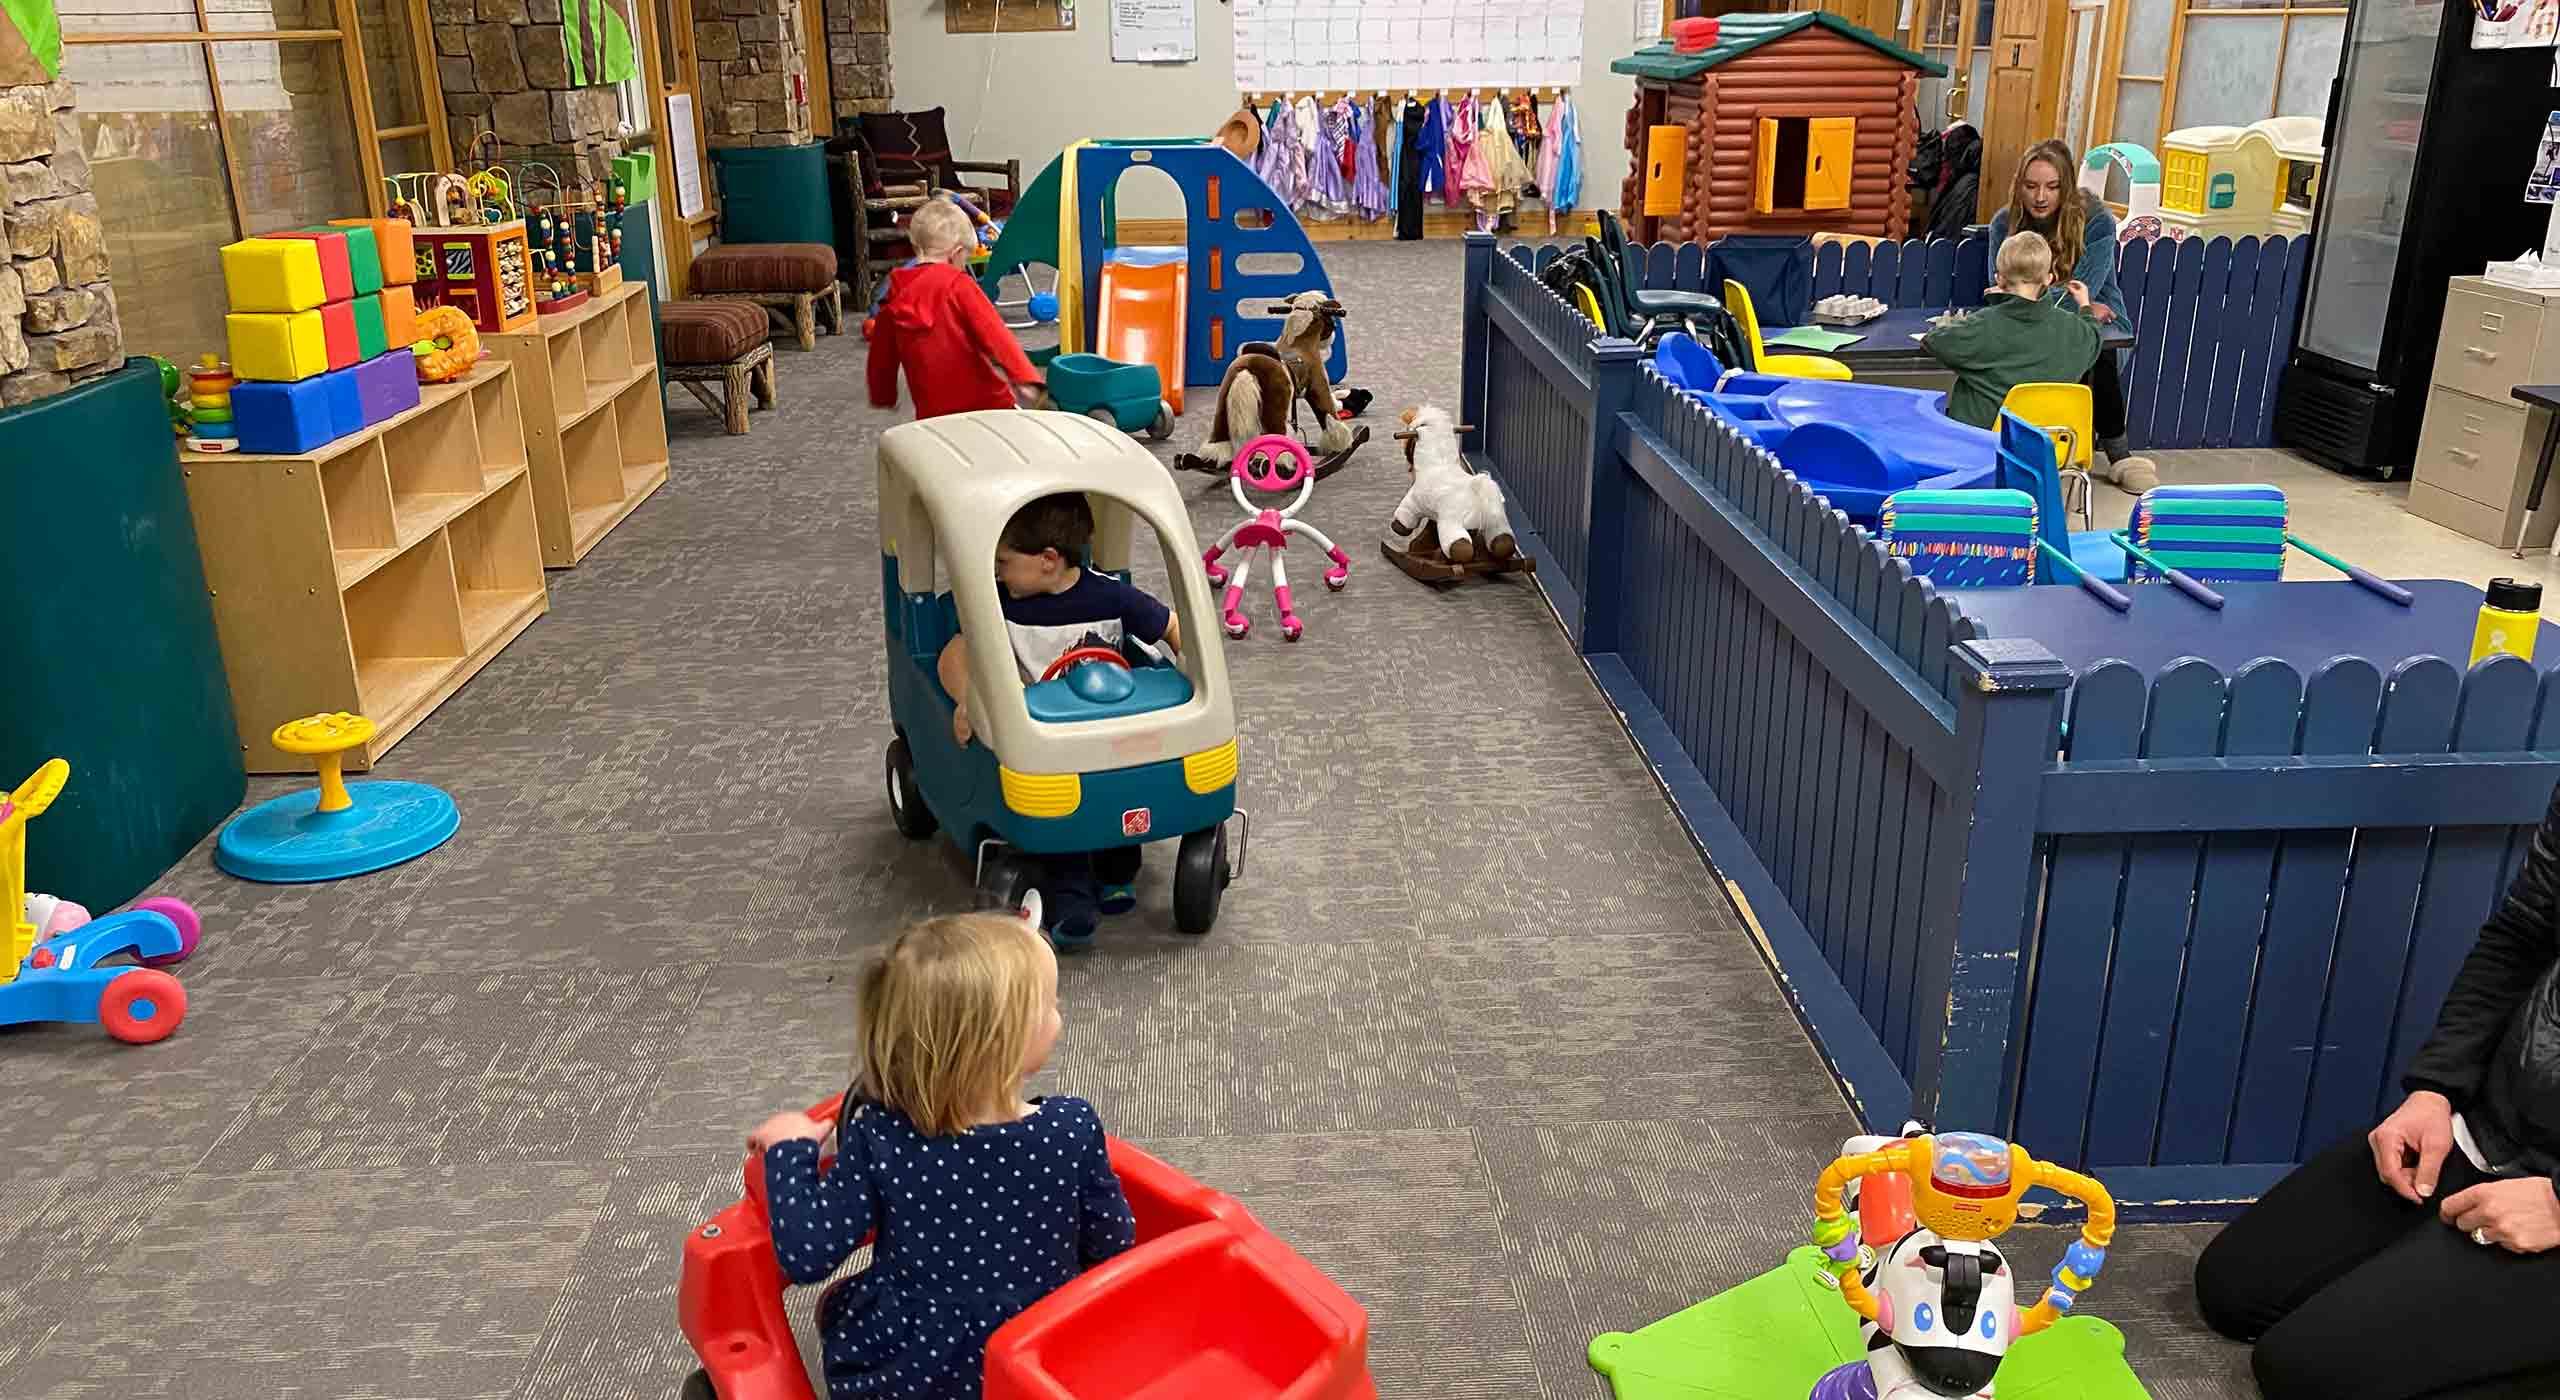 Cubs Camp Nursery Kids Playing Inside